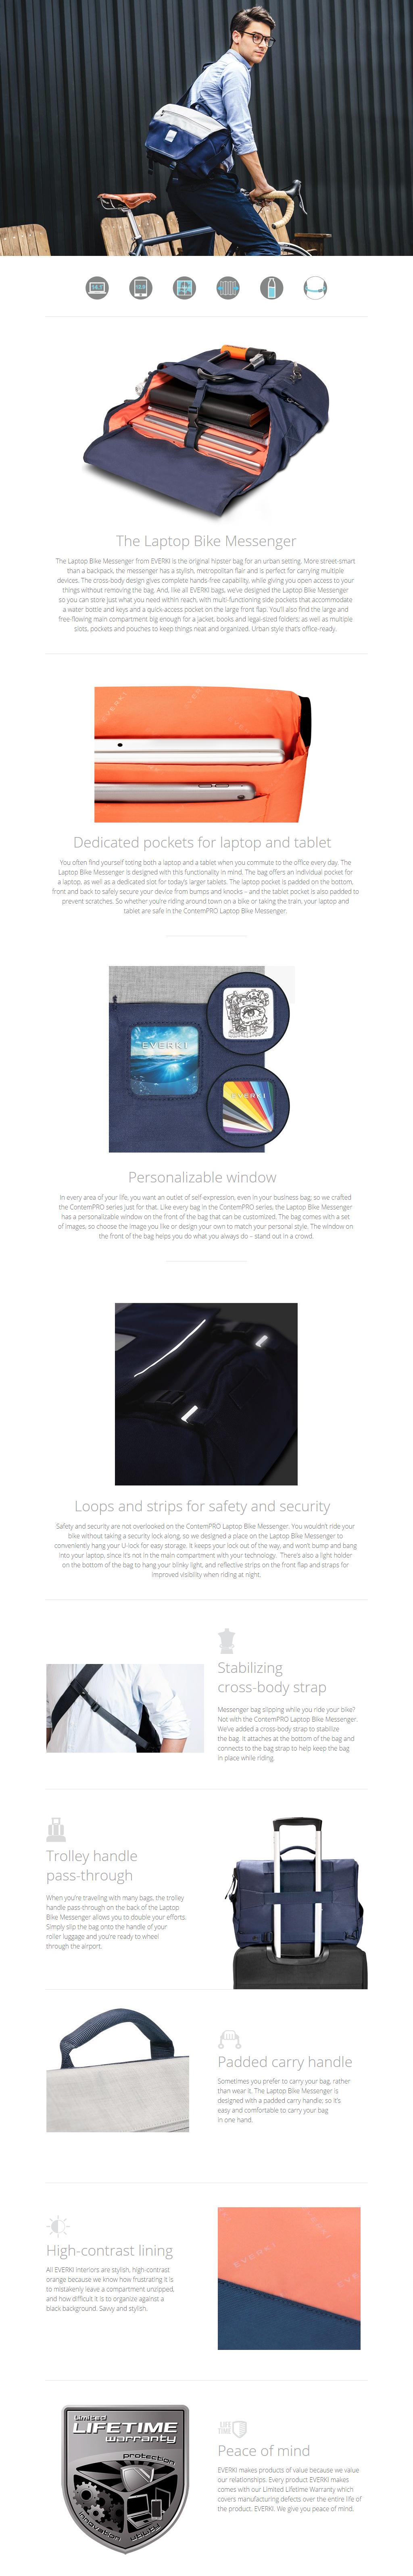 "A large marketing image providing additional information about the product Everki ContemPRO 14"" Laptop Bike Messenger Bag (Blue) - Additional alt info not provided"